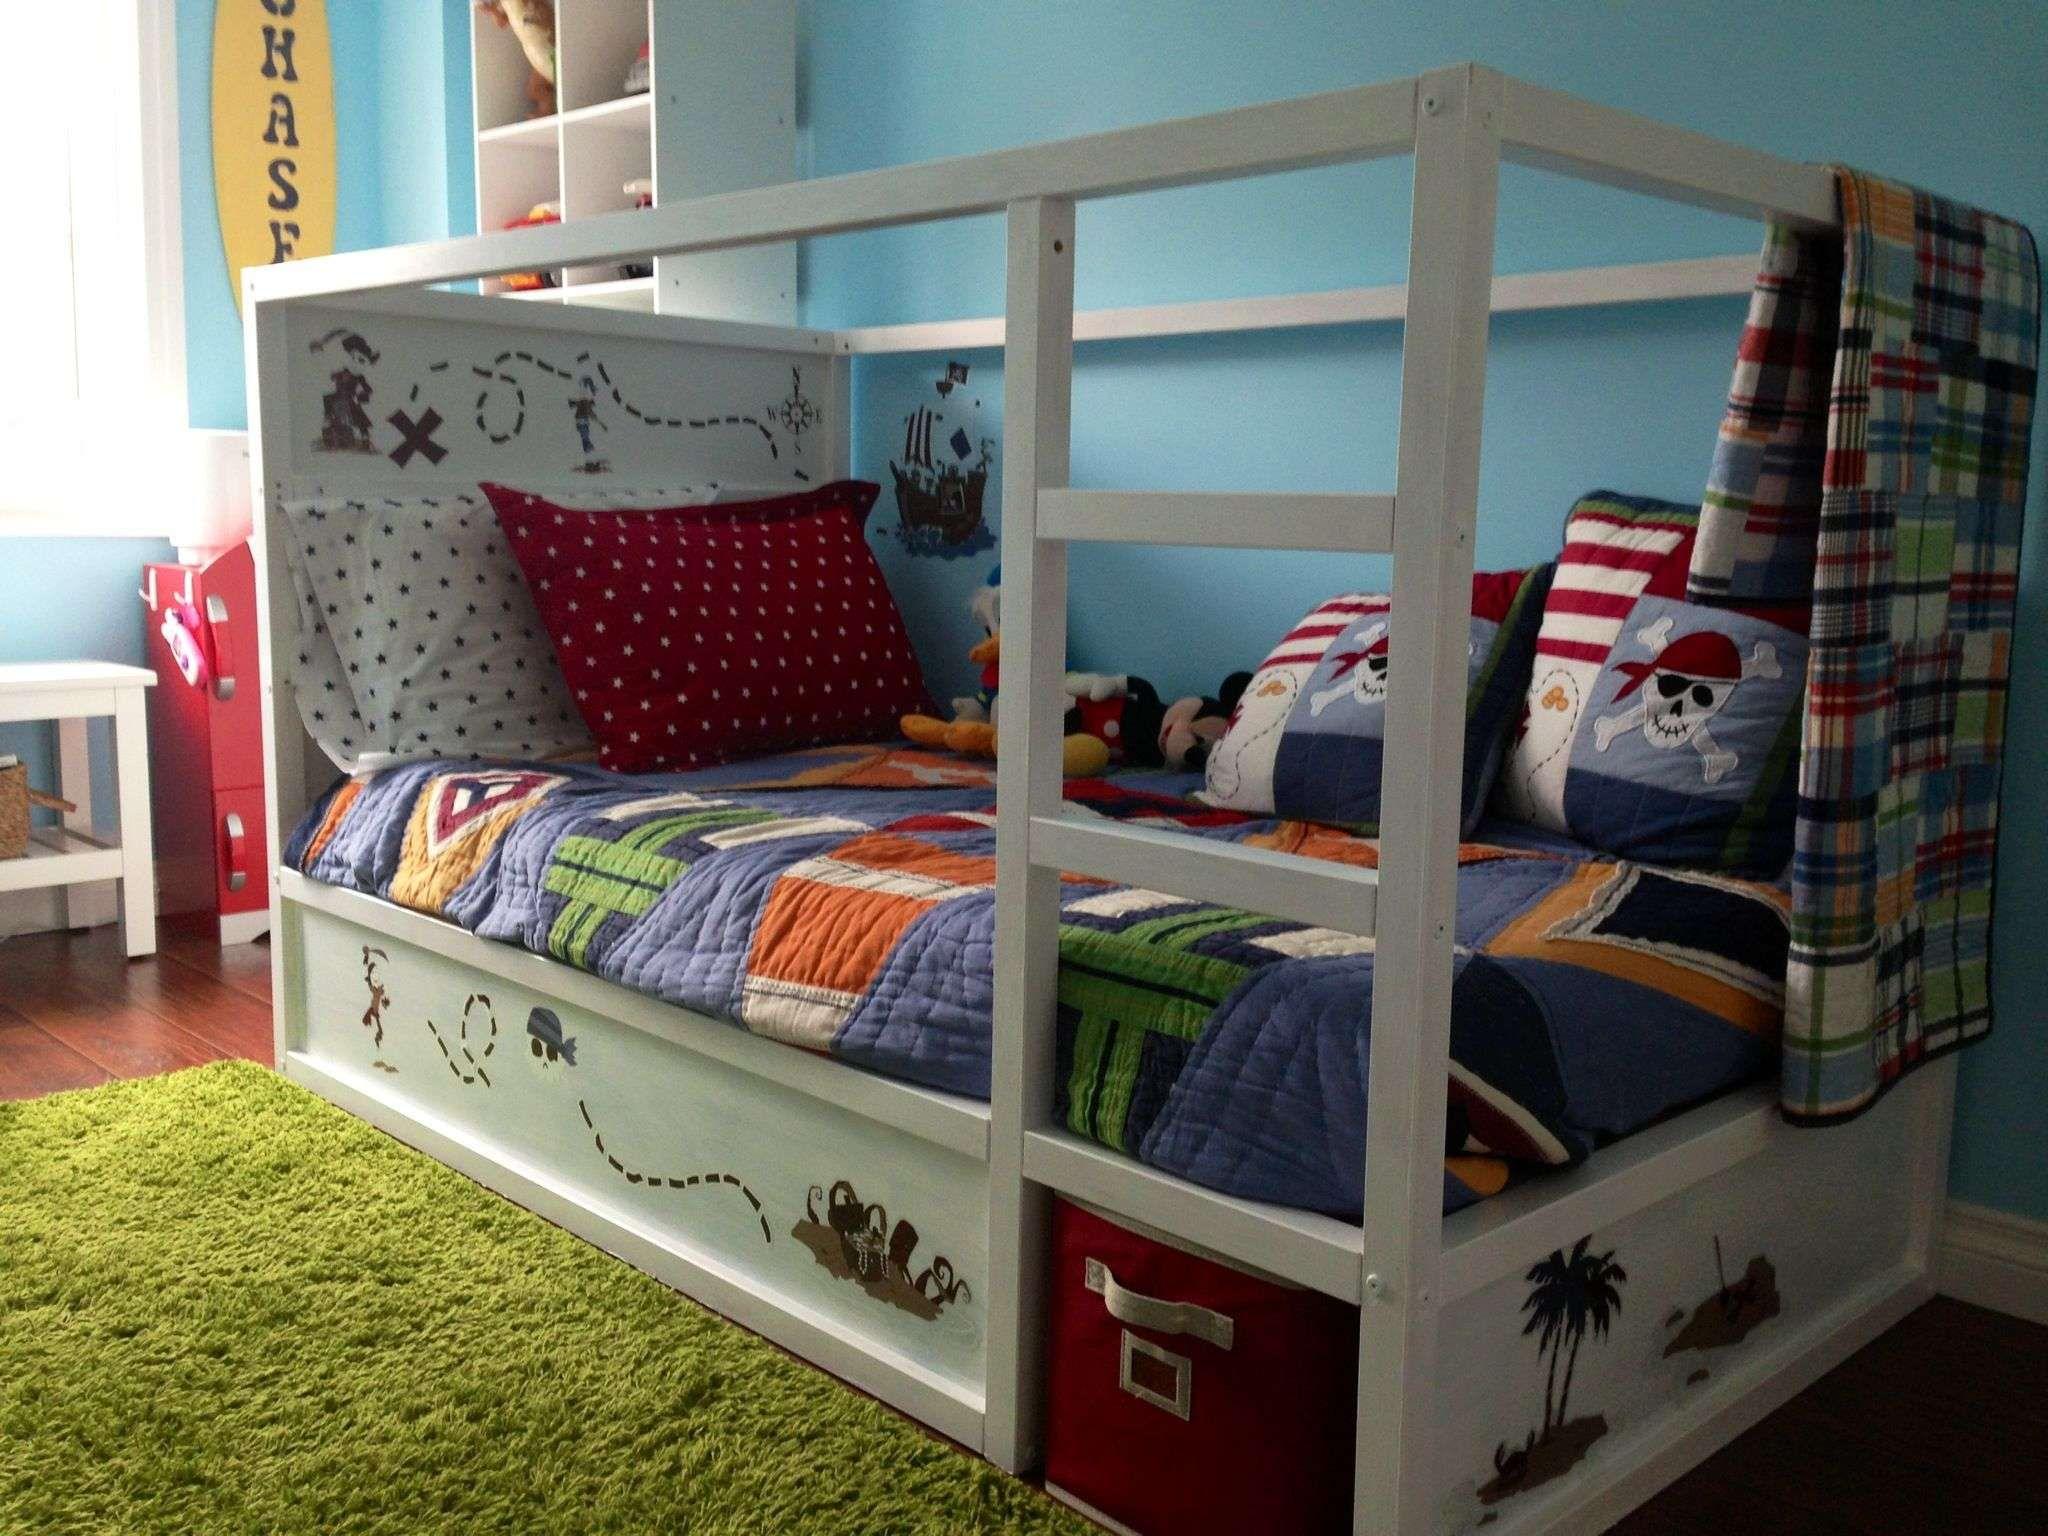 Etagenbett Ikea Tromsö Seitlich Versetzt Etagenbetten : Etagenbett ikea mydal: kinderzimmer für zwei jungs ideen zum